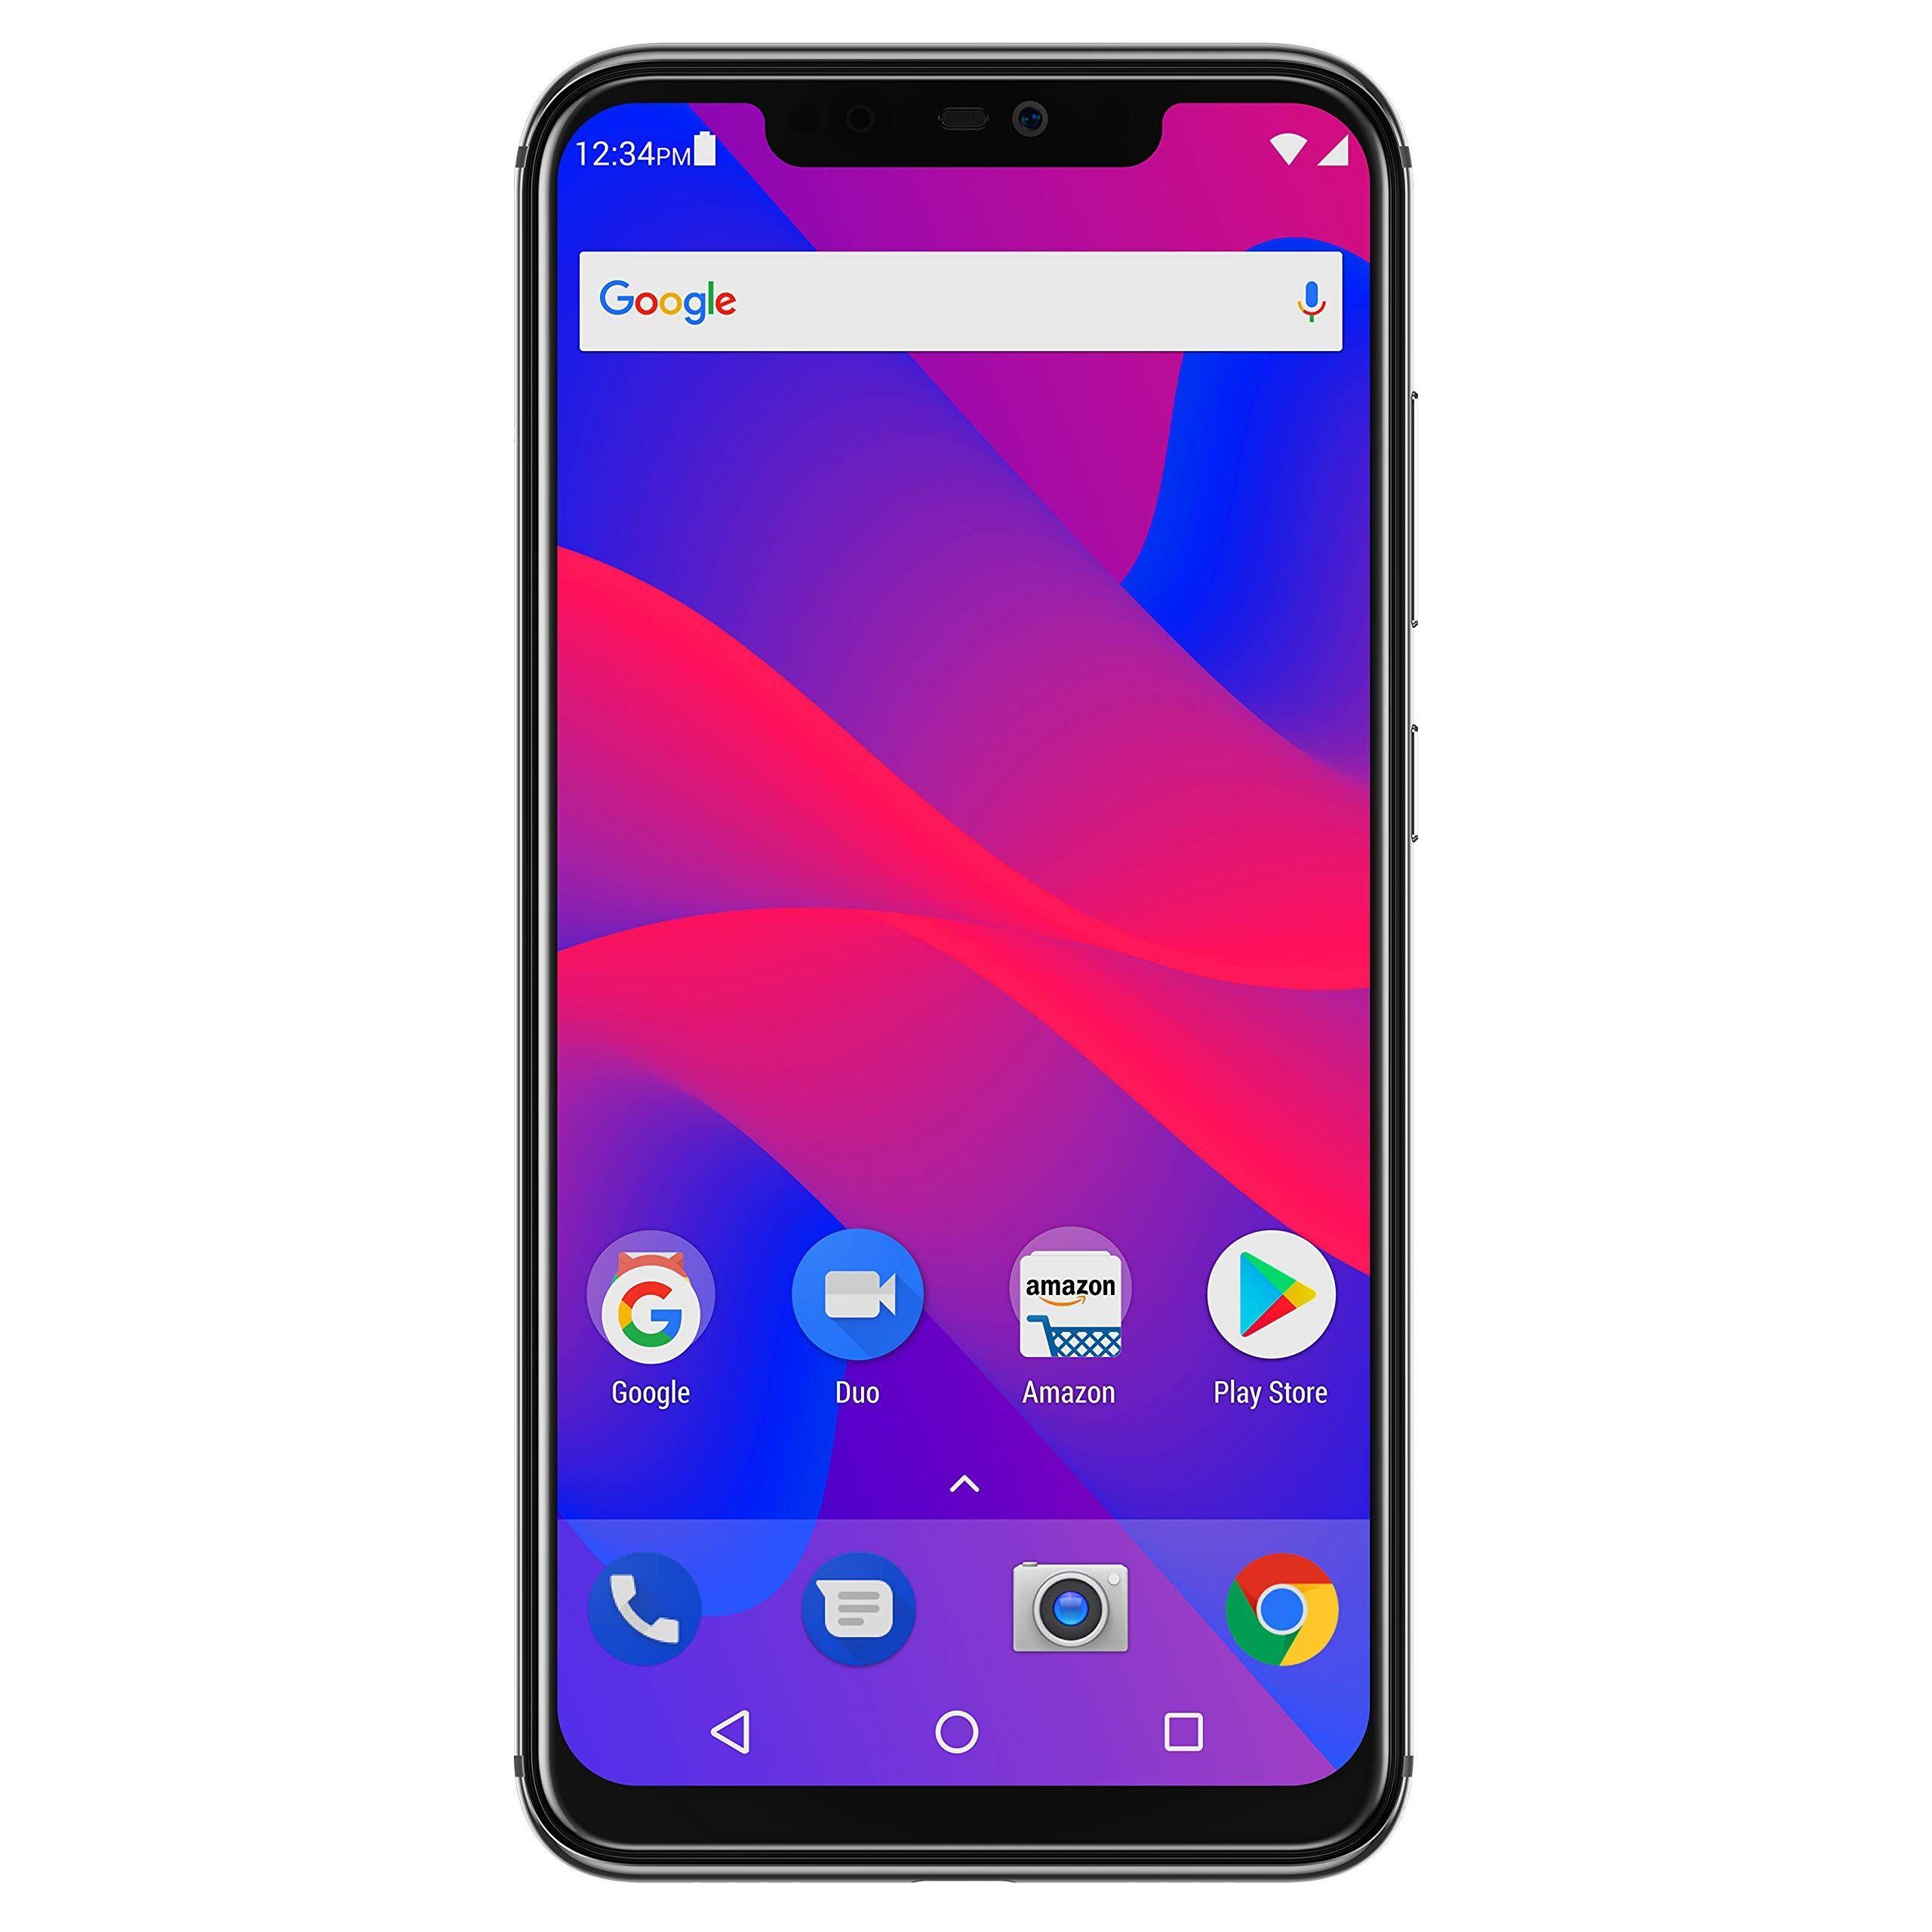 Blu Vivo Xi 6 2 Full Hd Display Smartphone 128gb 6gb Ram Ai Dual Cameras Certified Refurbished Https Unlocked Cell Phones Best Smartphone Smartphone